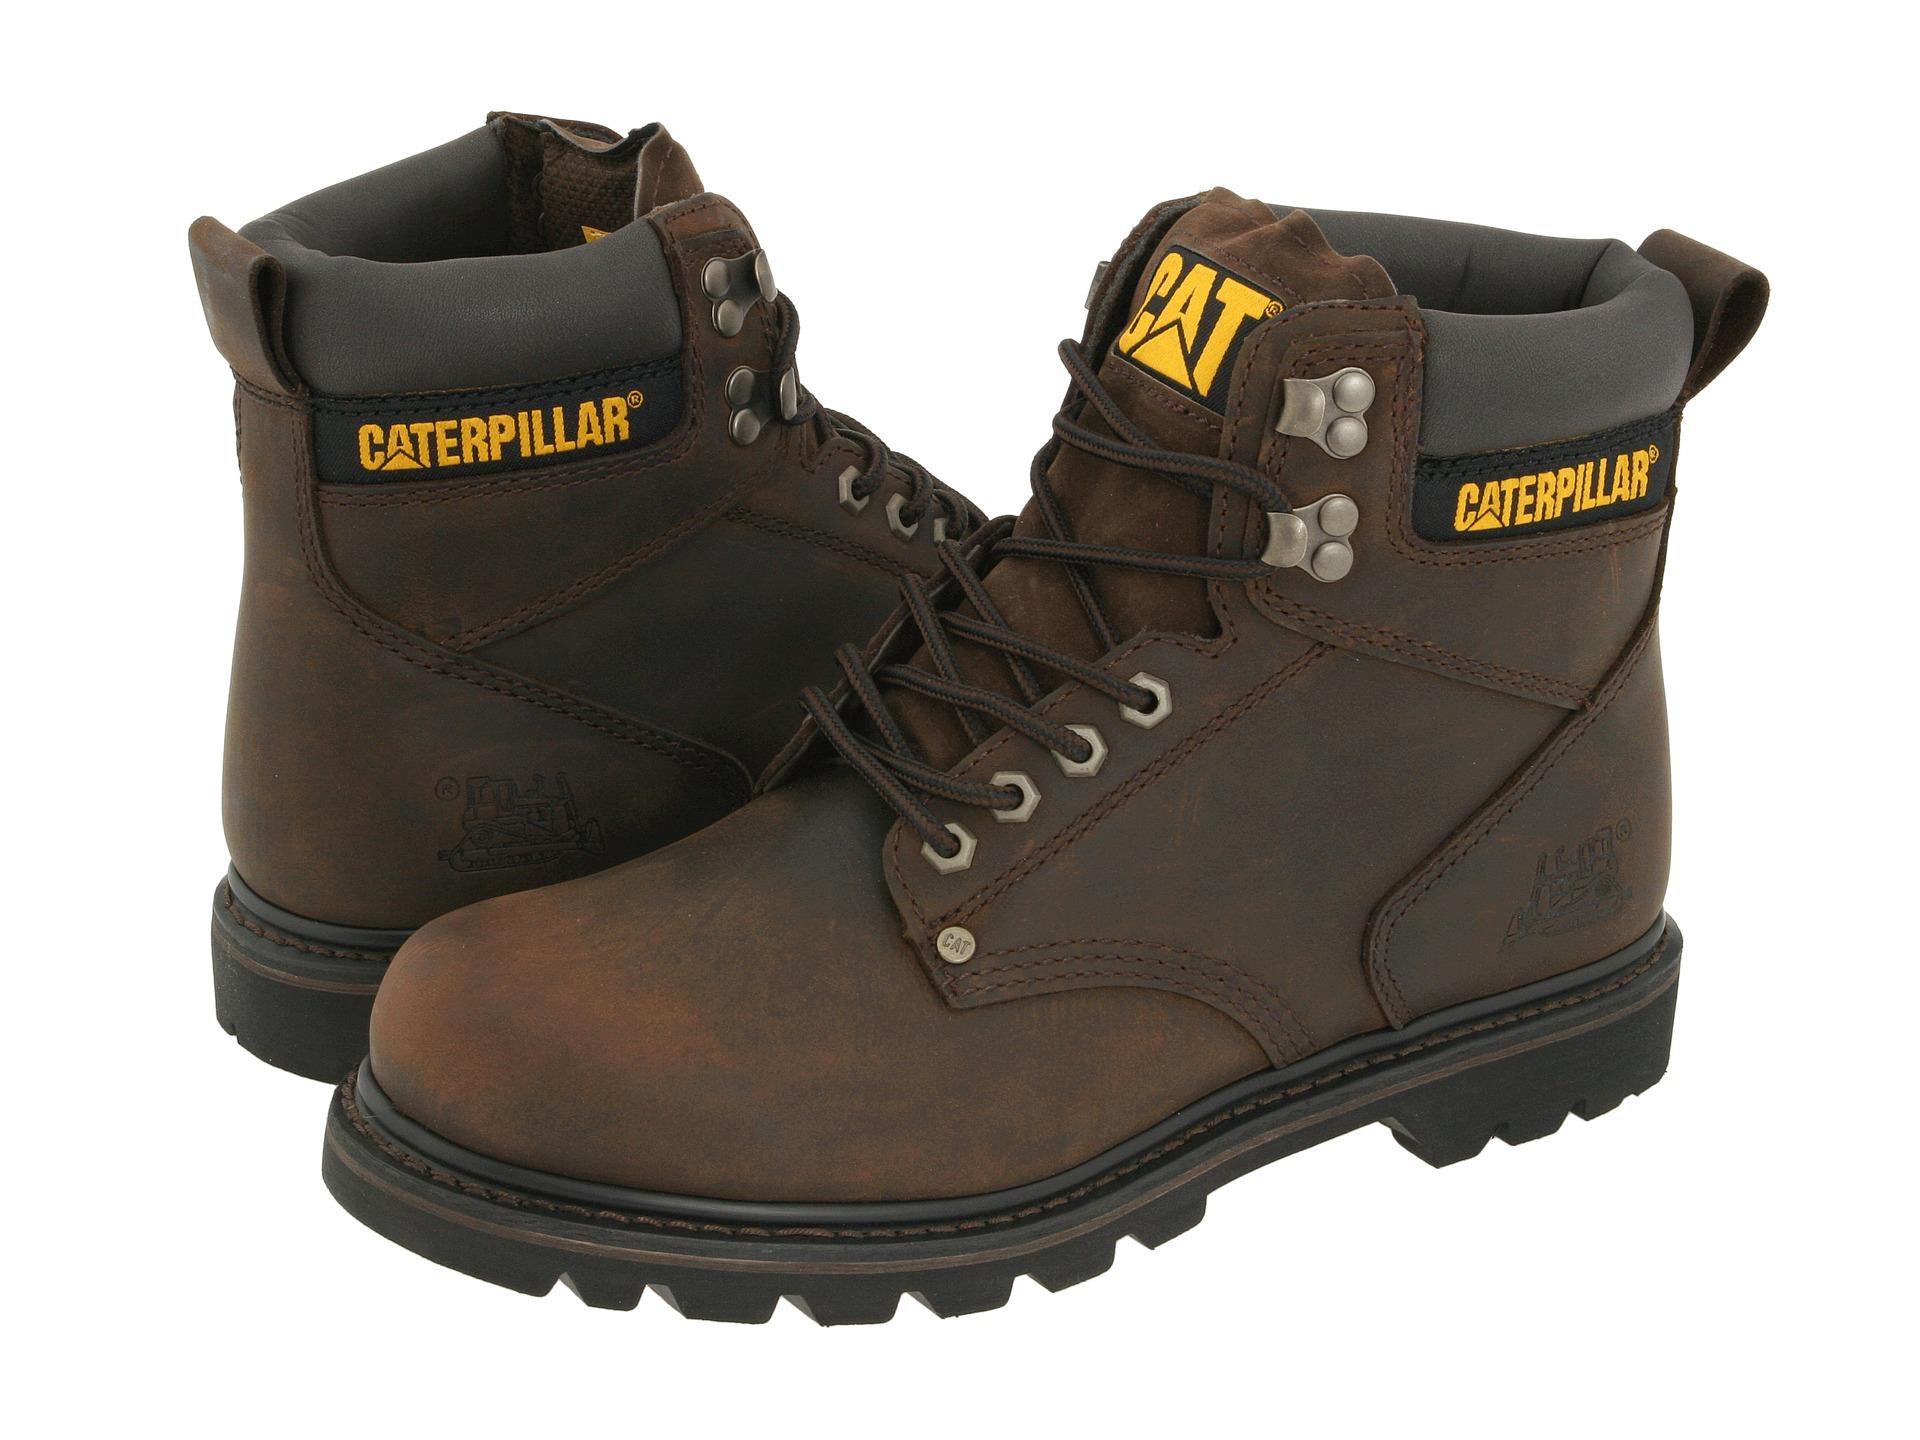 caterpillar 2nd shift zappos com shipping both ways